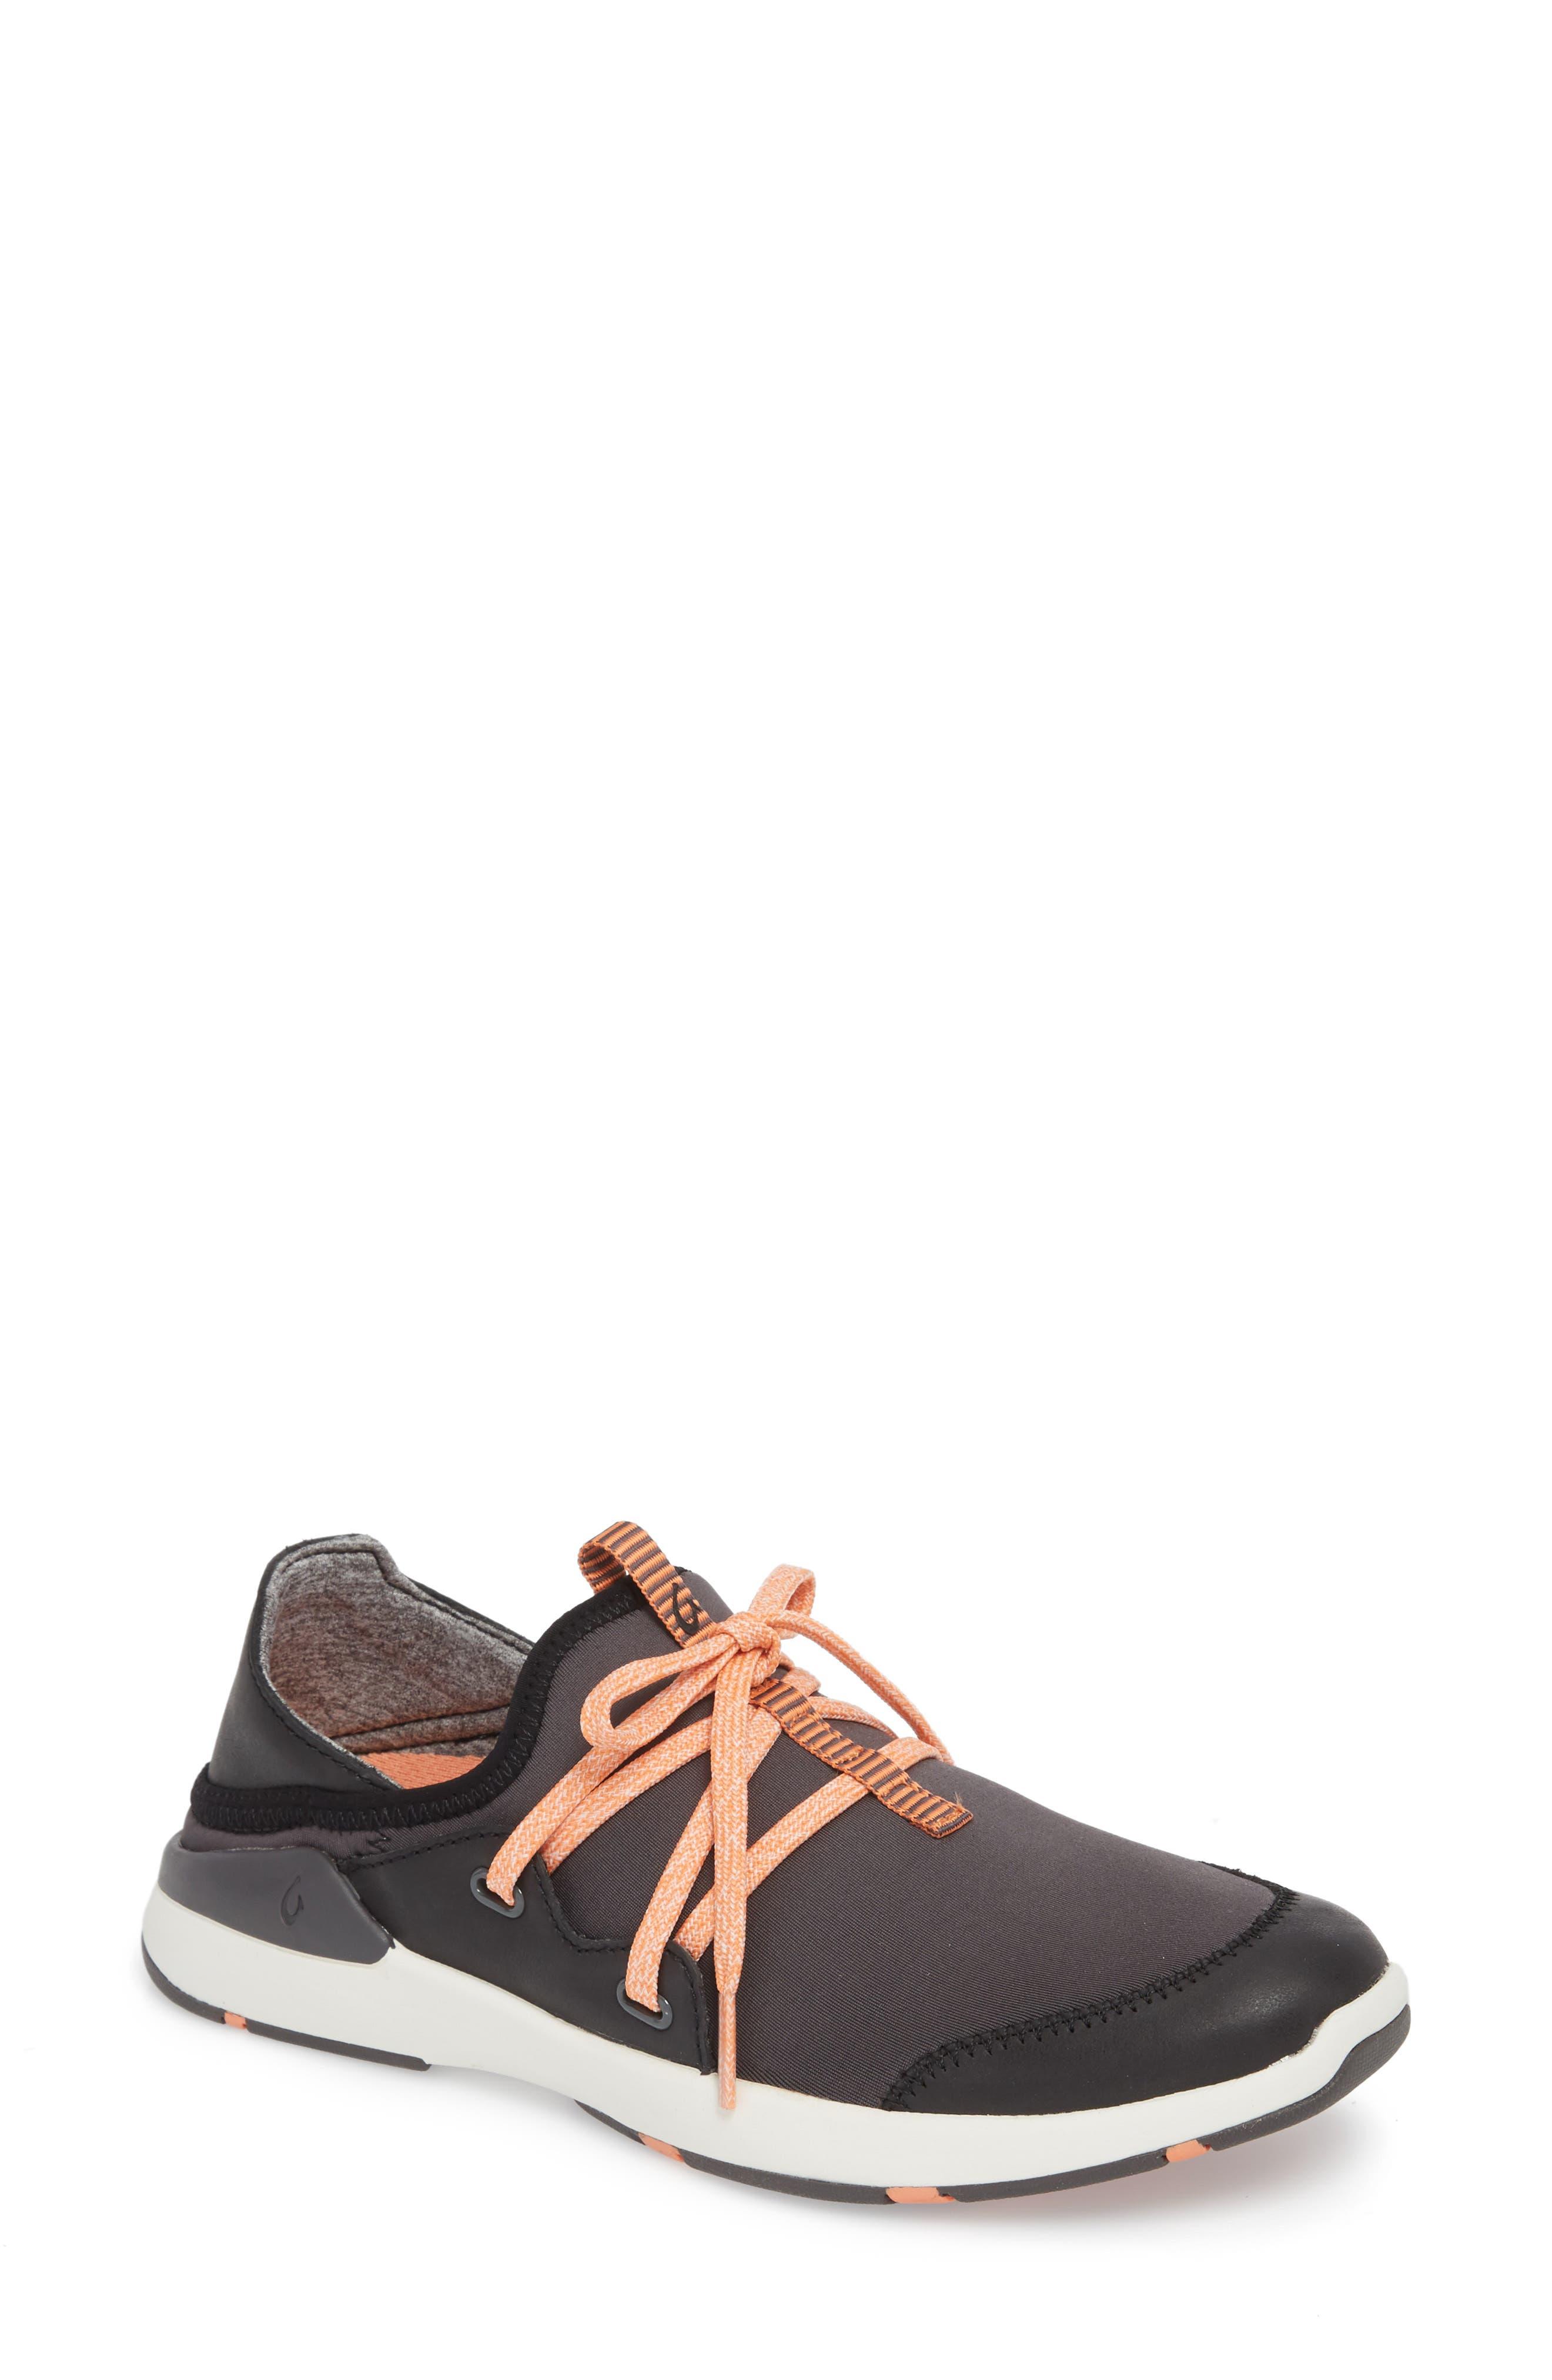 Miki Li Convertible Sneaker,                             Main thumbnail 1, color,                             PAVEMENT/ BLACK FABRIC